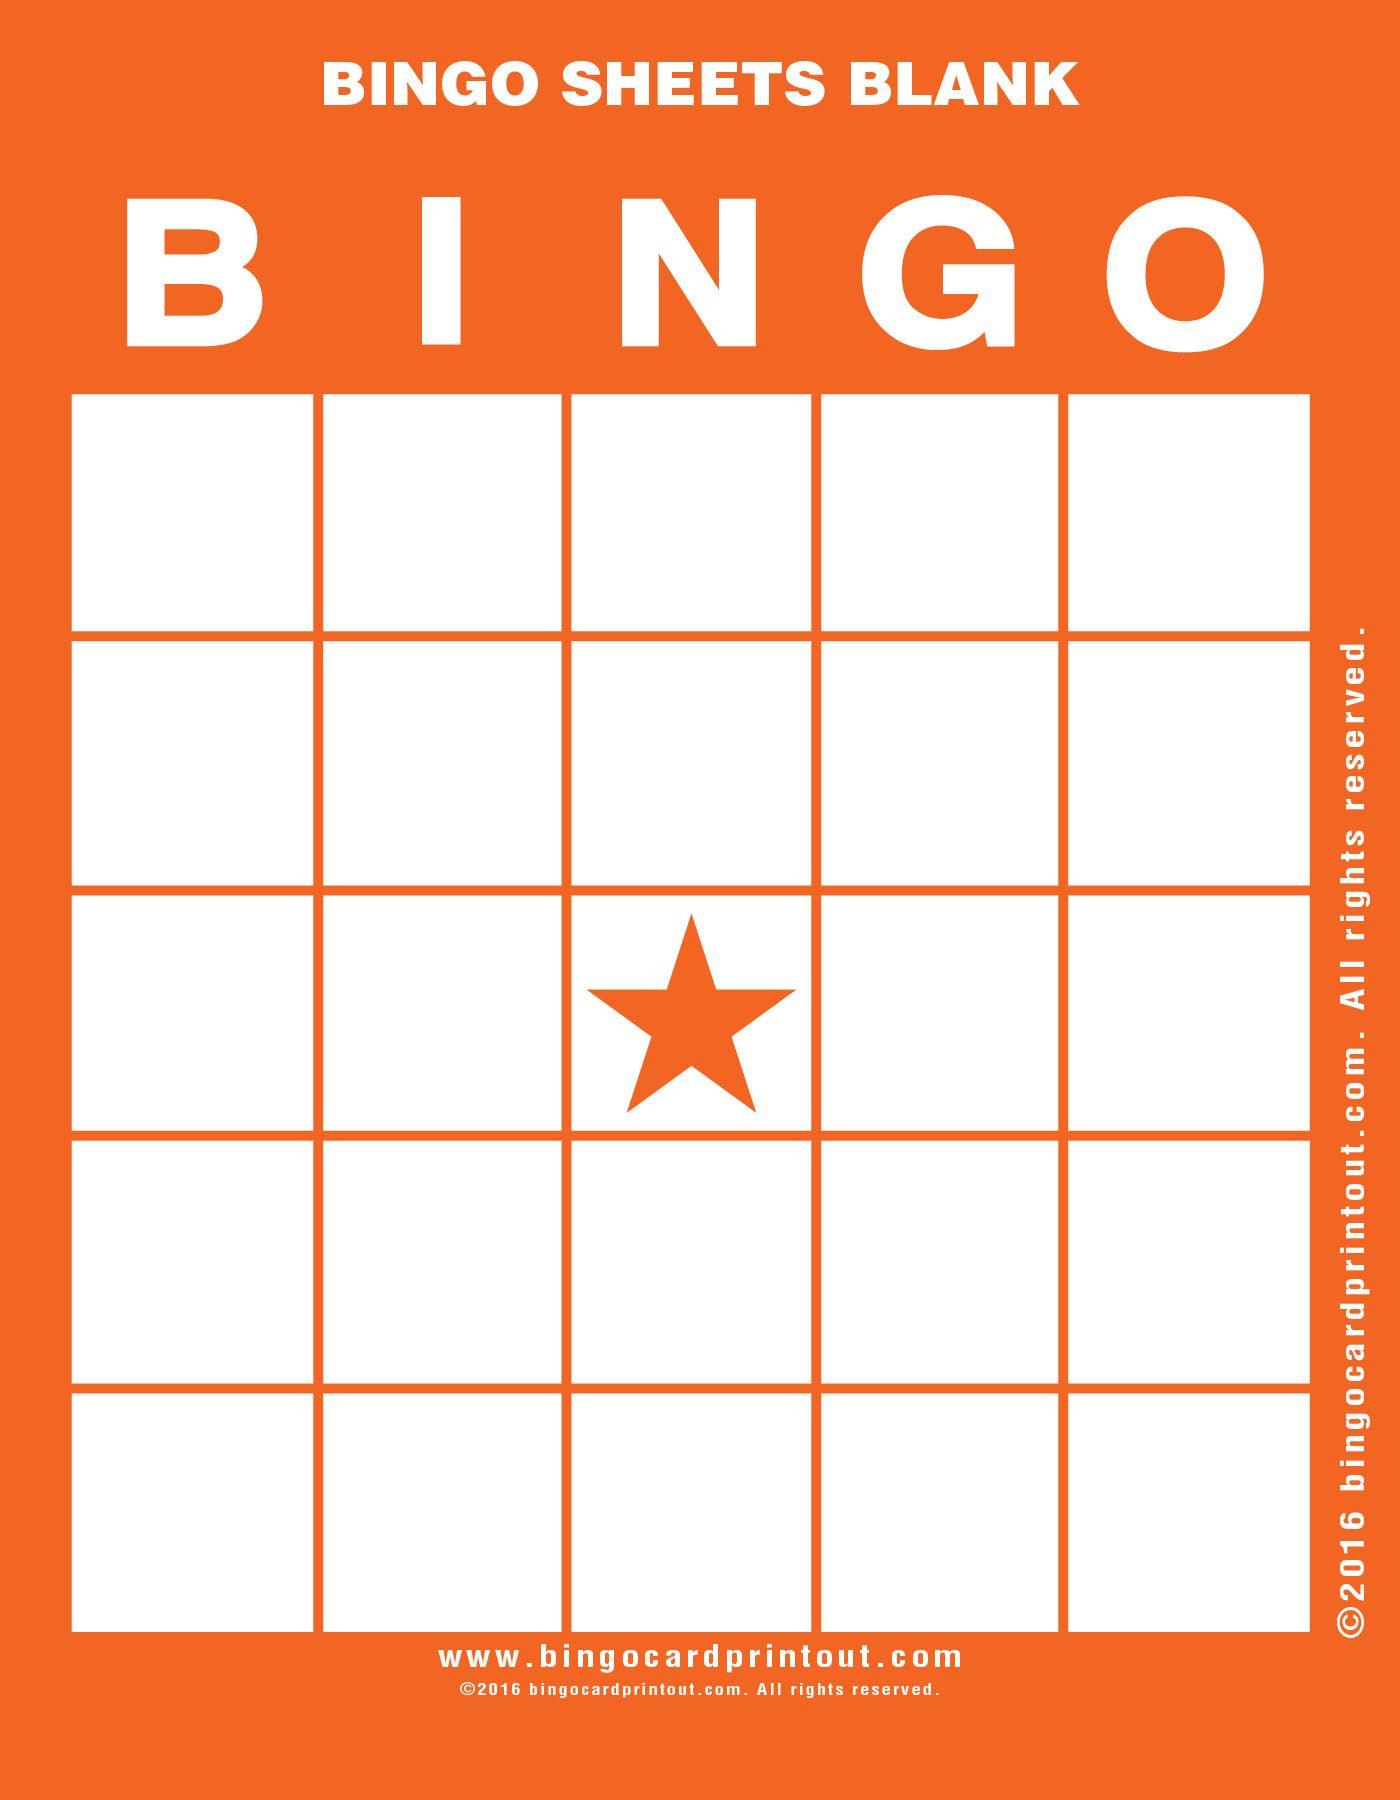 Bingo Sheets Blank | Bingo Cards Printable, Bingo Card